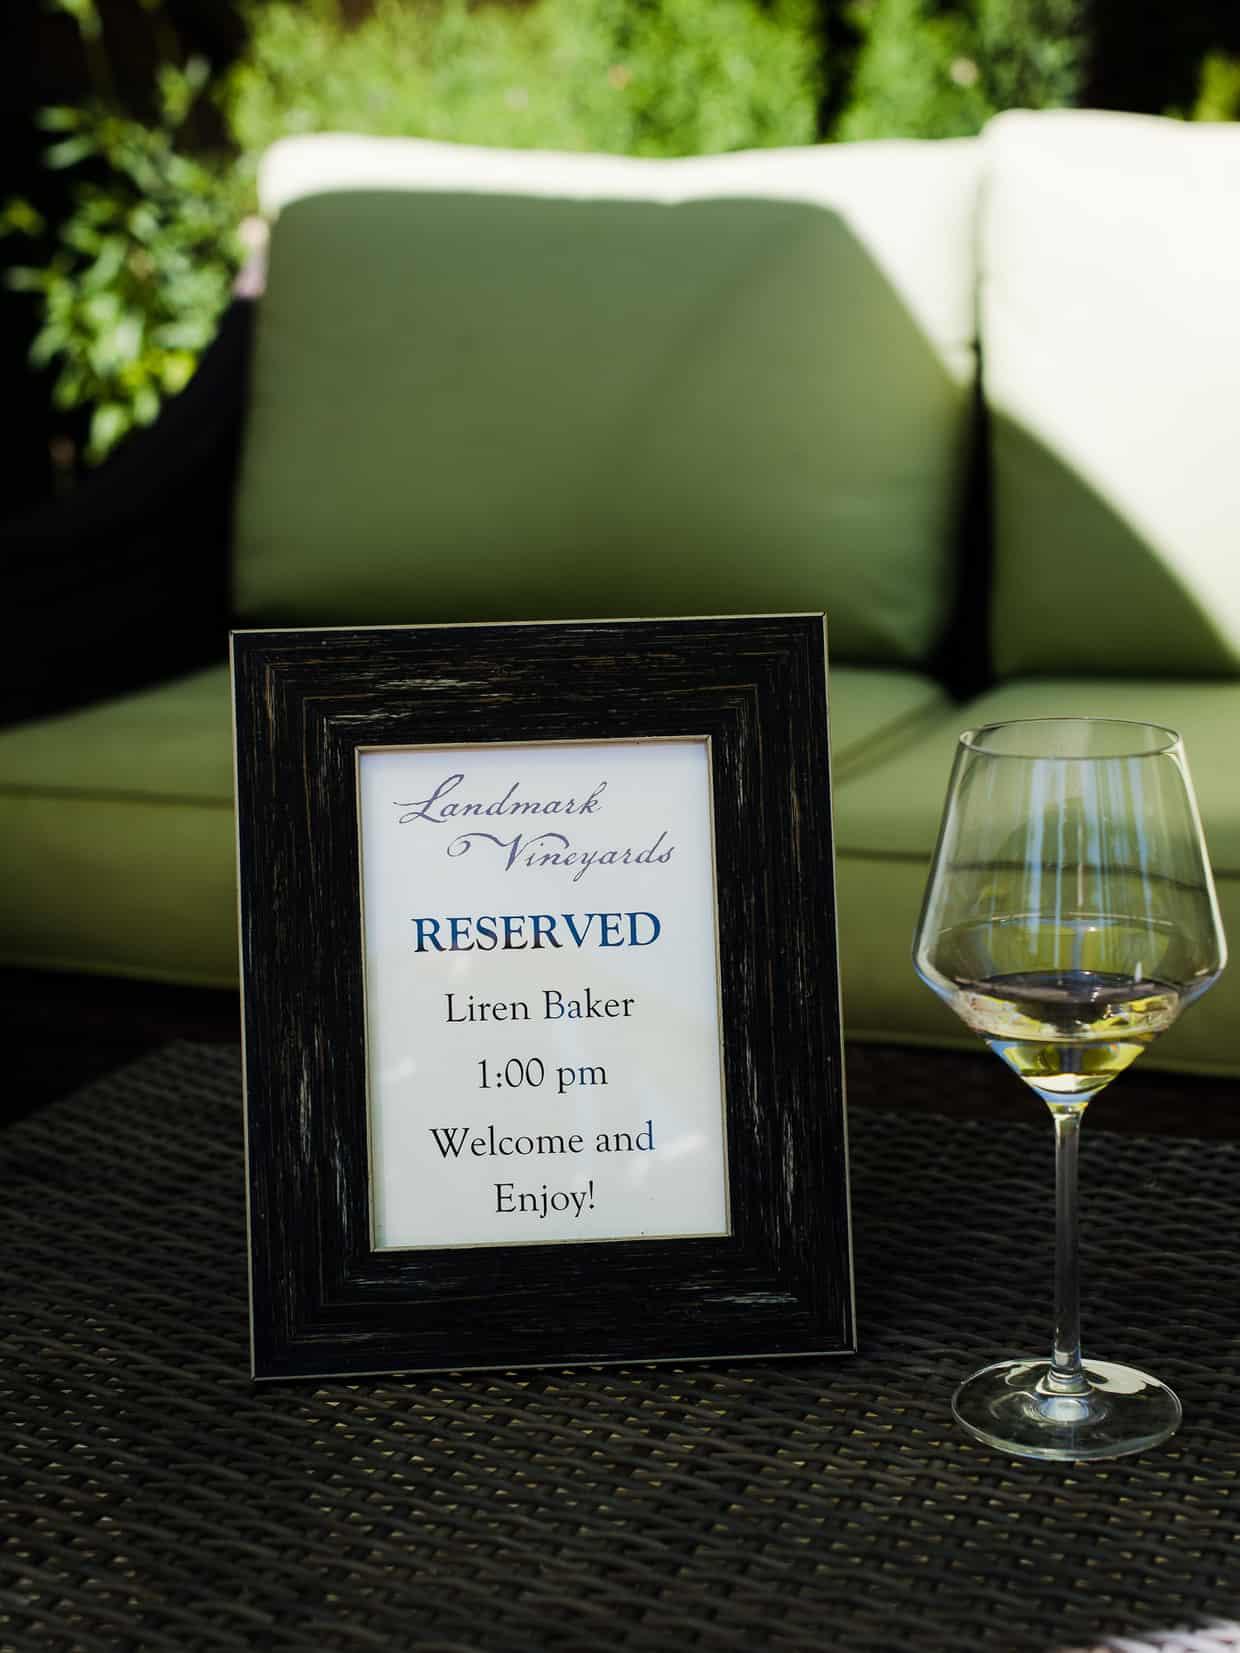 Reserved seating at Landmark Vineyards.